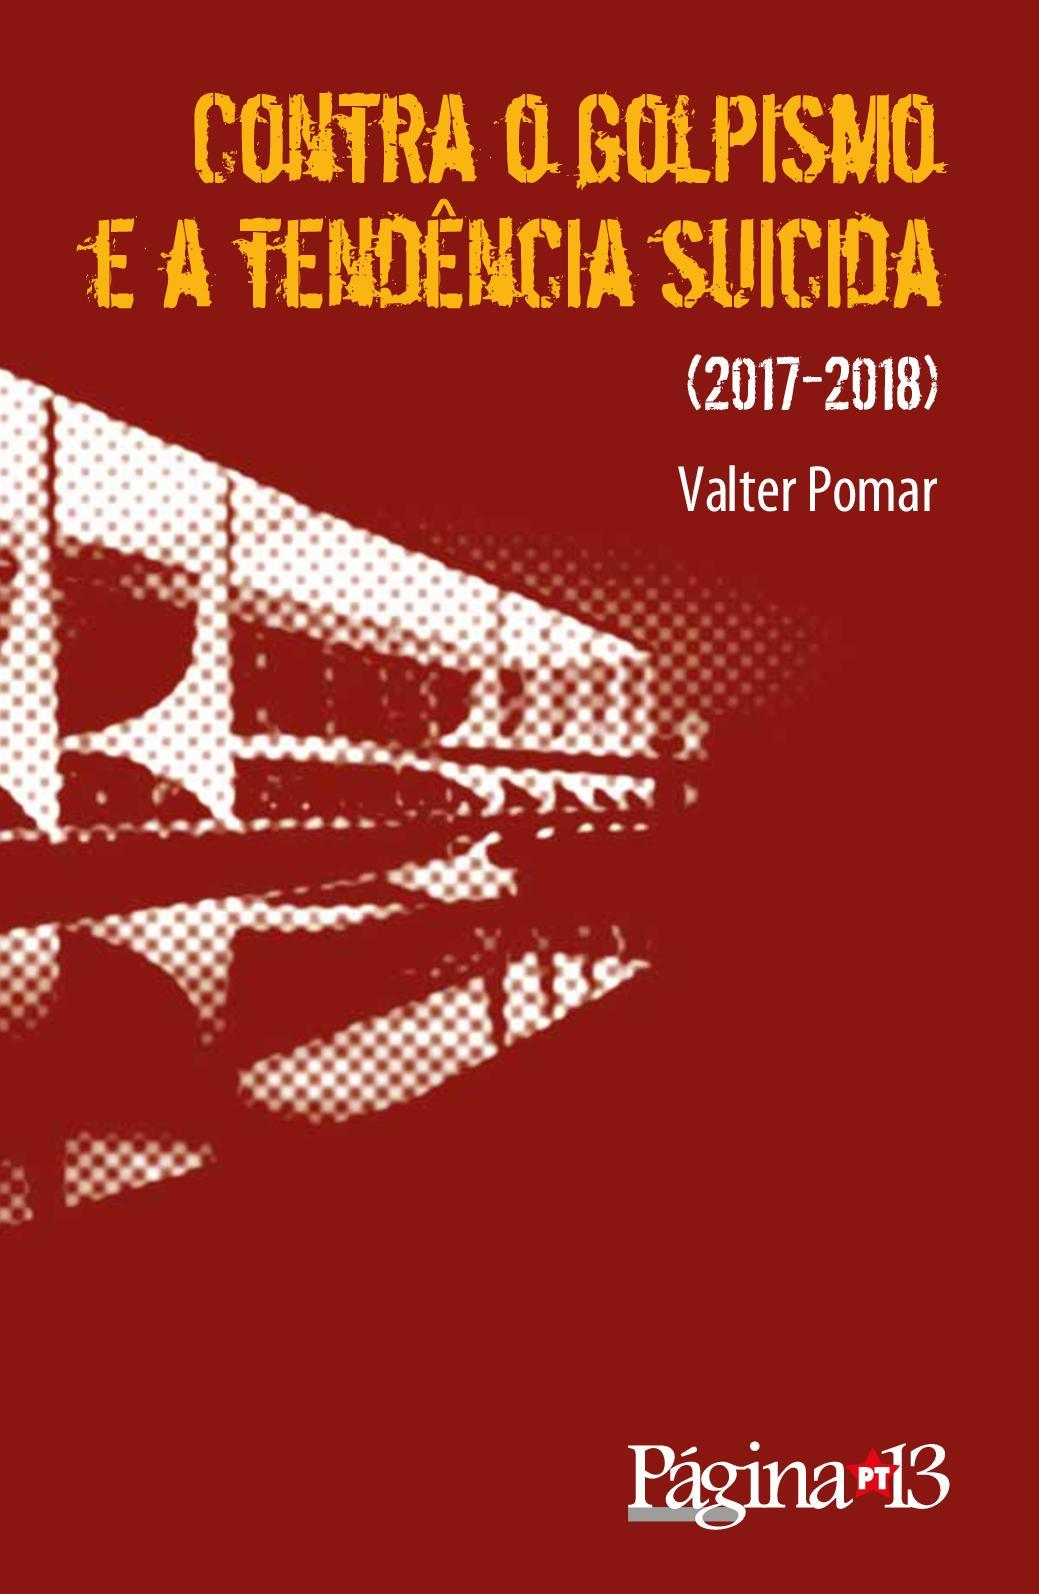 8d6e1ce3d Calaméo - Contra o golpismo e a tendência suicida (2017 e 2018)  Valter  Pomar